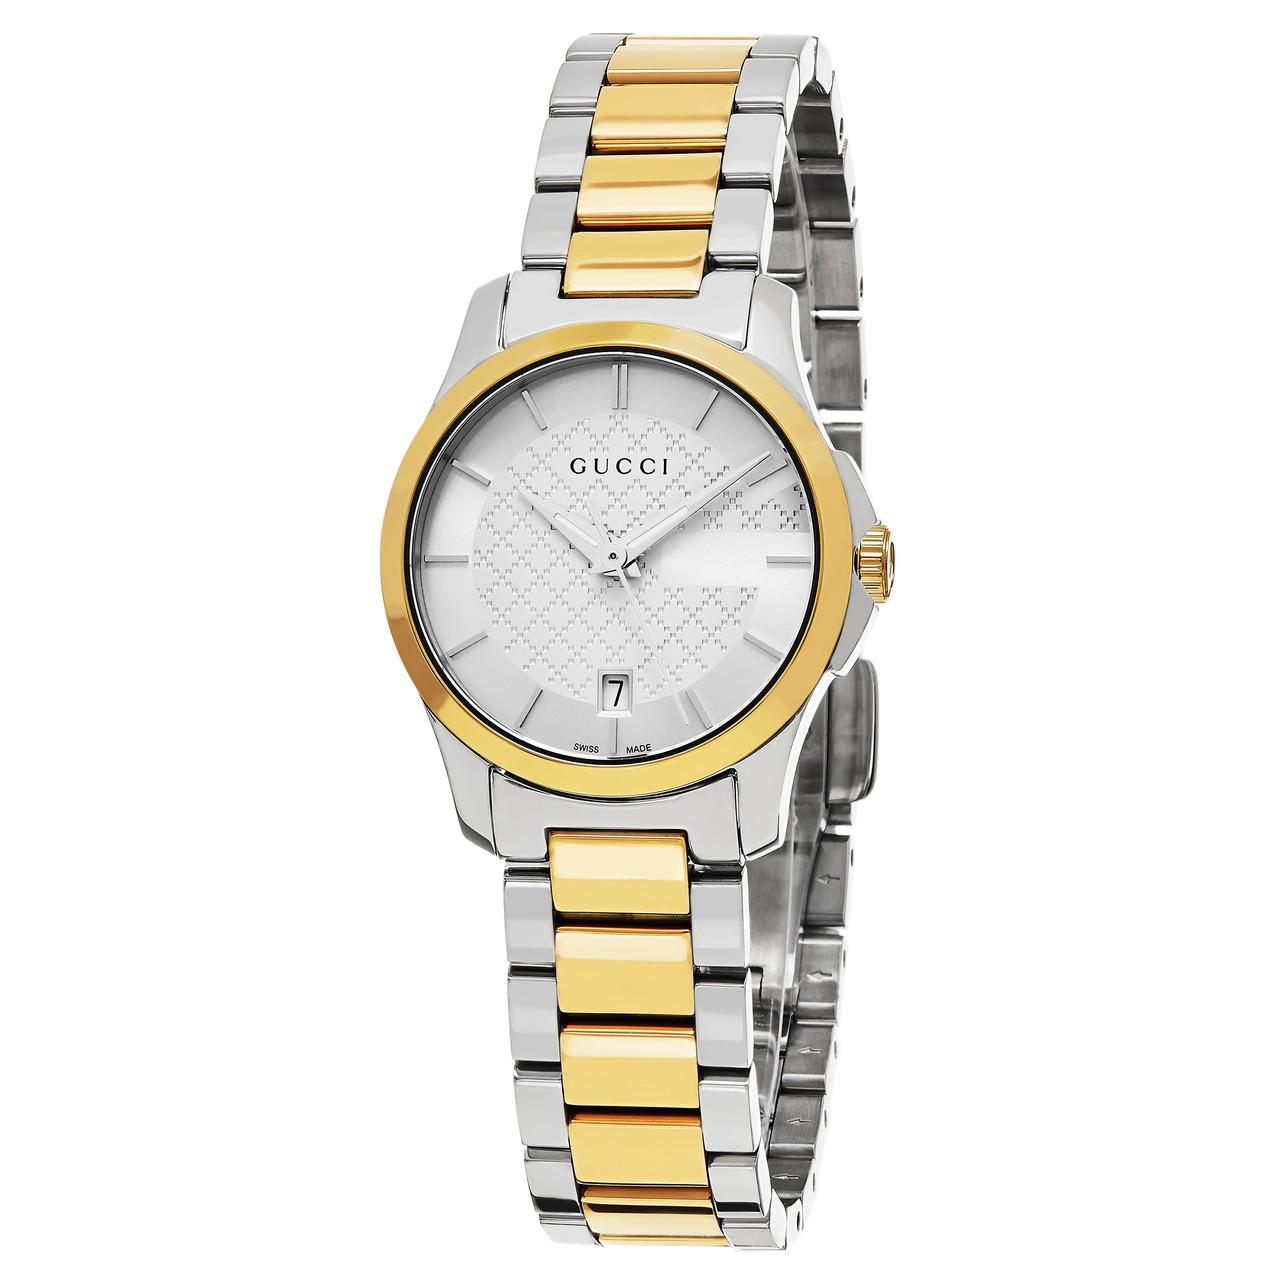 f3d2546c4ea ... Gucci Women s YA126531 Timeless Two Tone Stainless Steel Swiss Quartz  Watch. Image 1